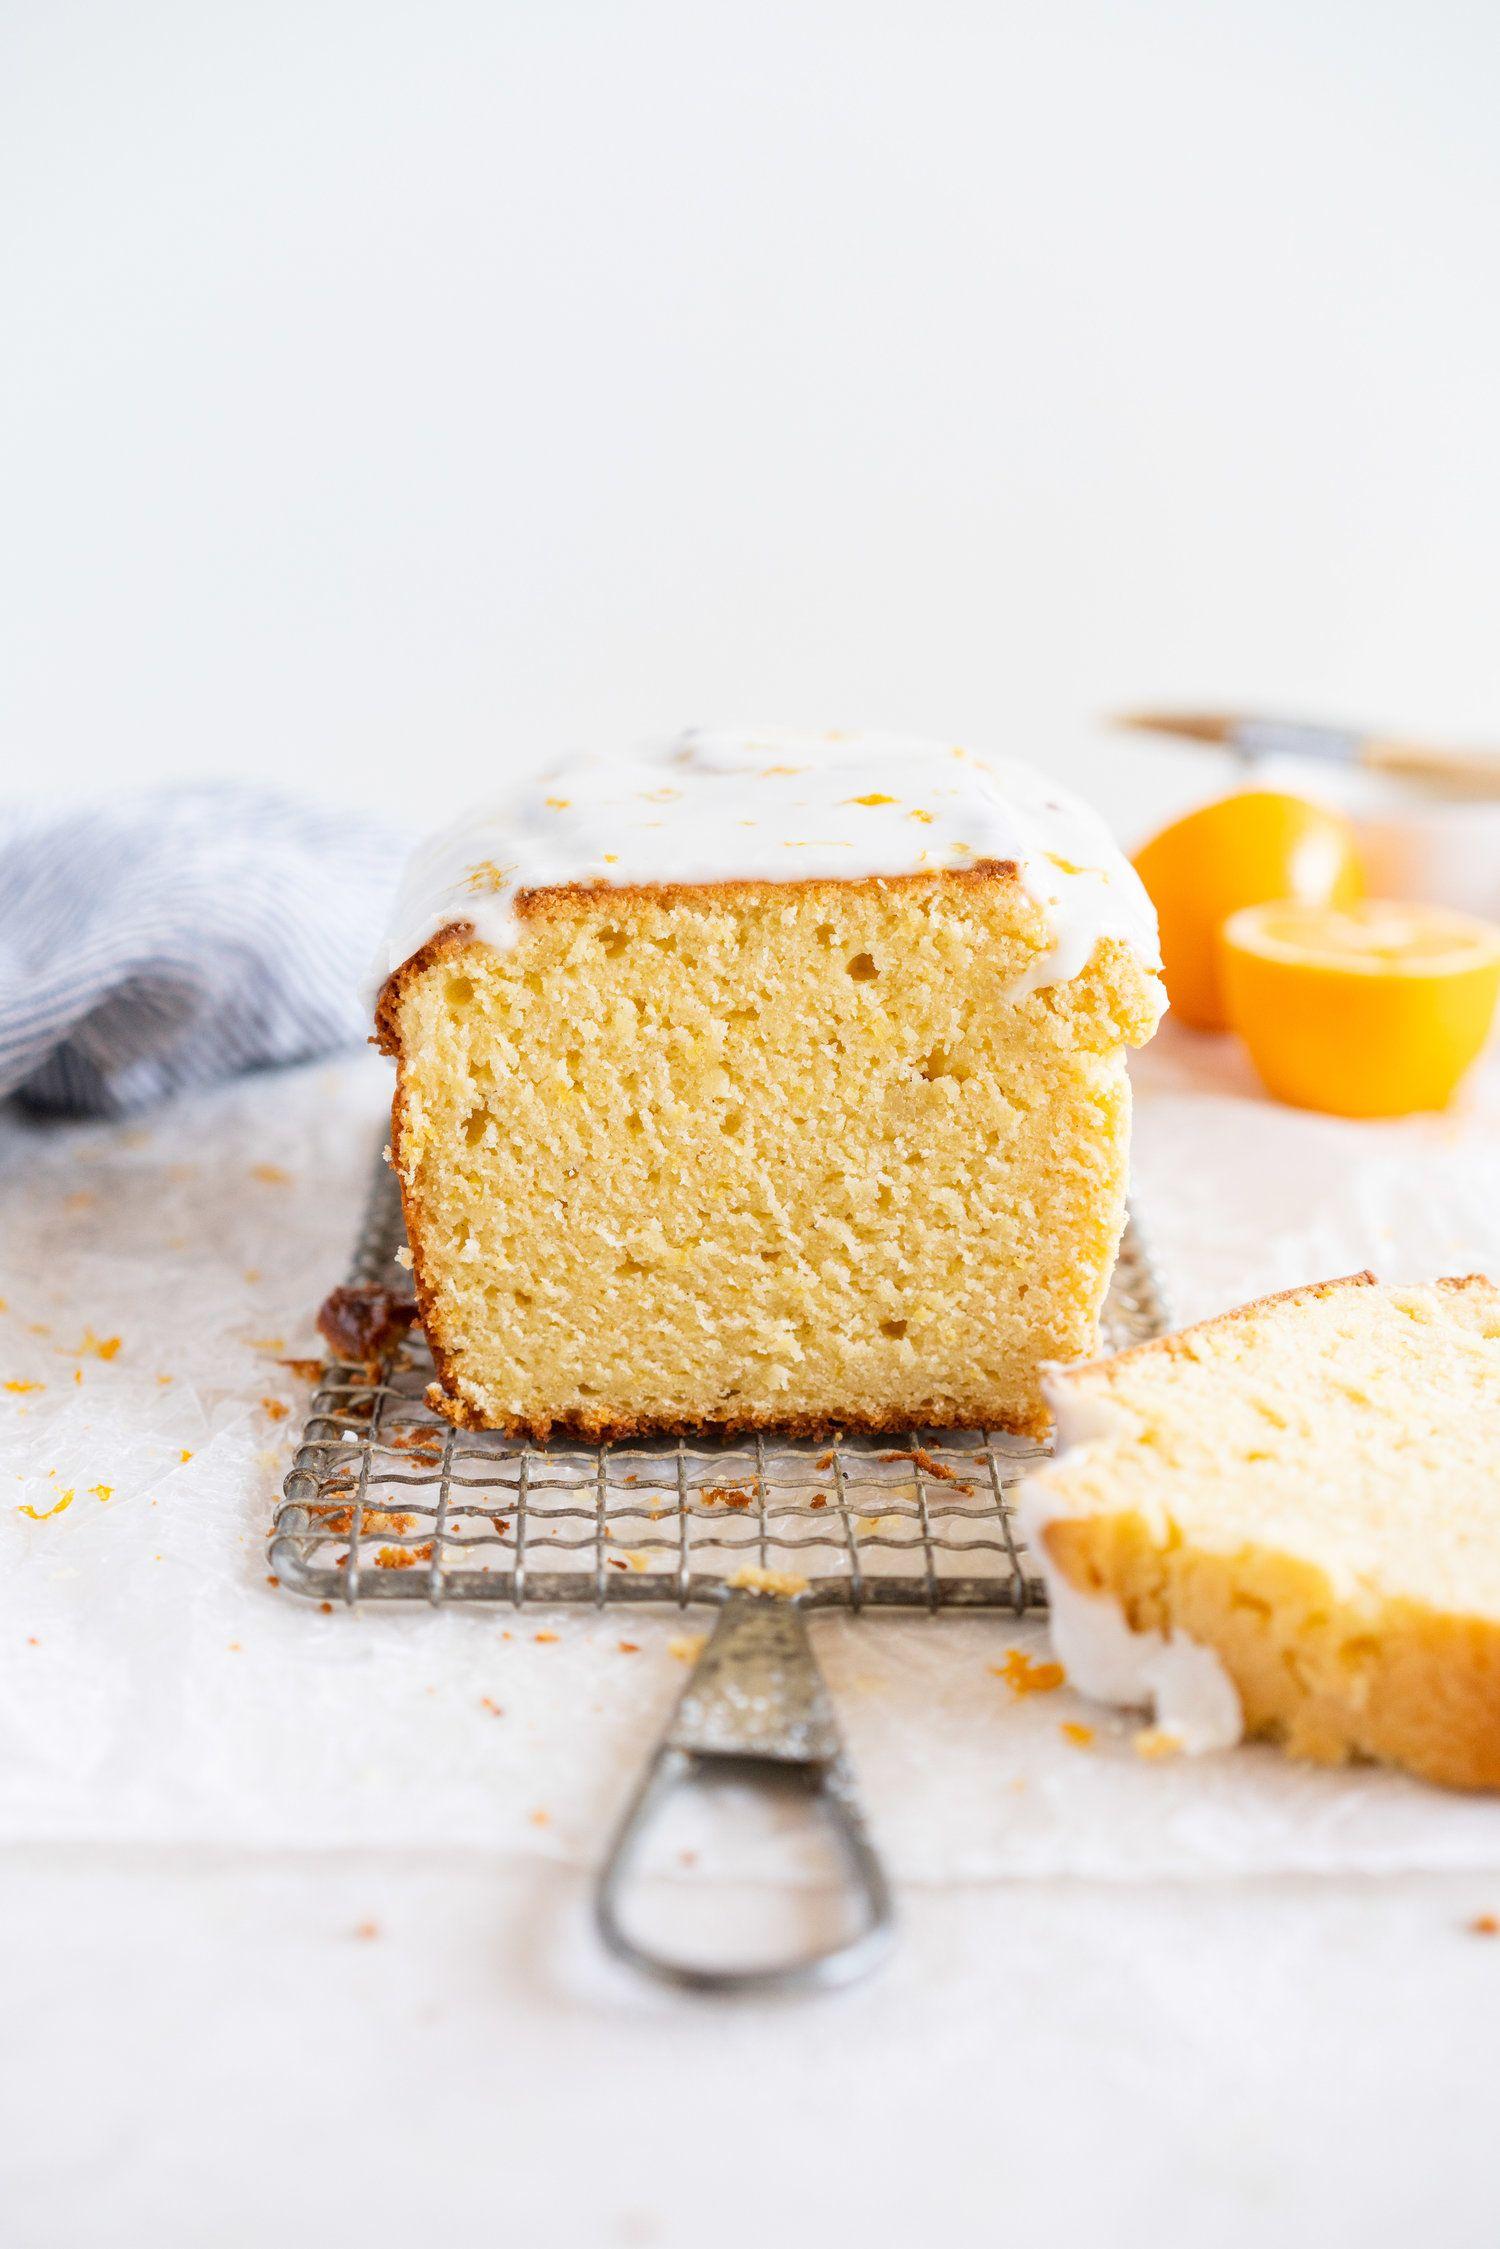 Lemon And Sour Cream Loaf Cake With Lemon Glaze Recipe Cake Recipes Baking Almond Recipes